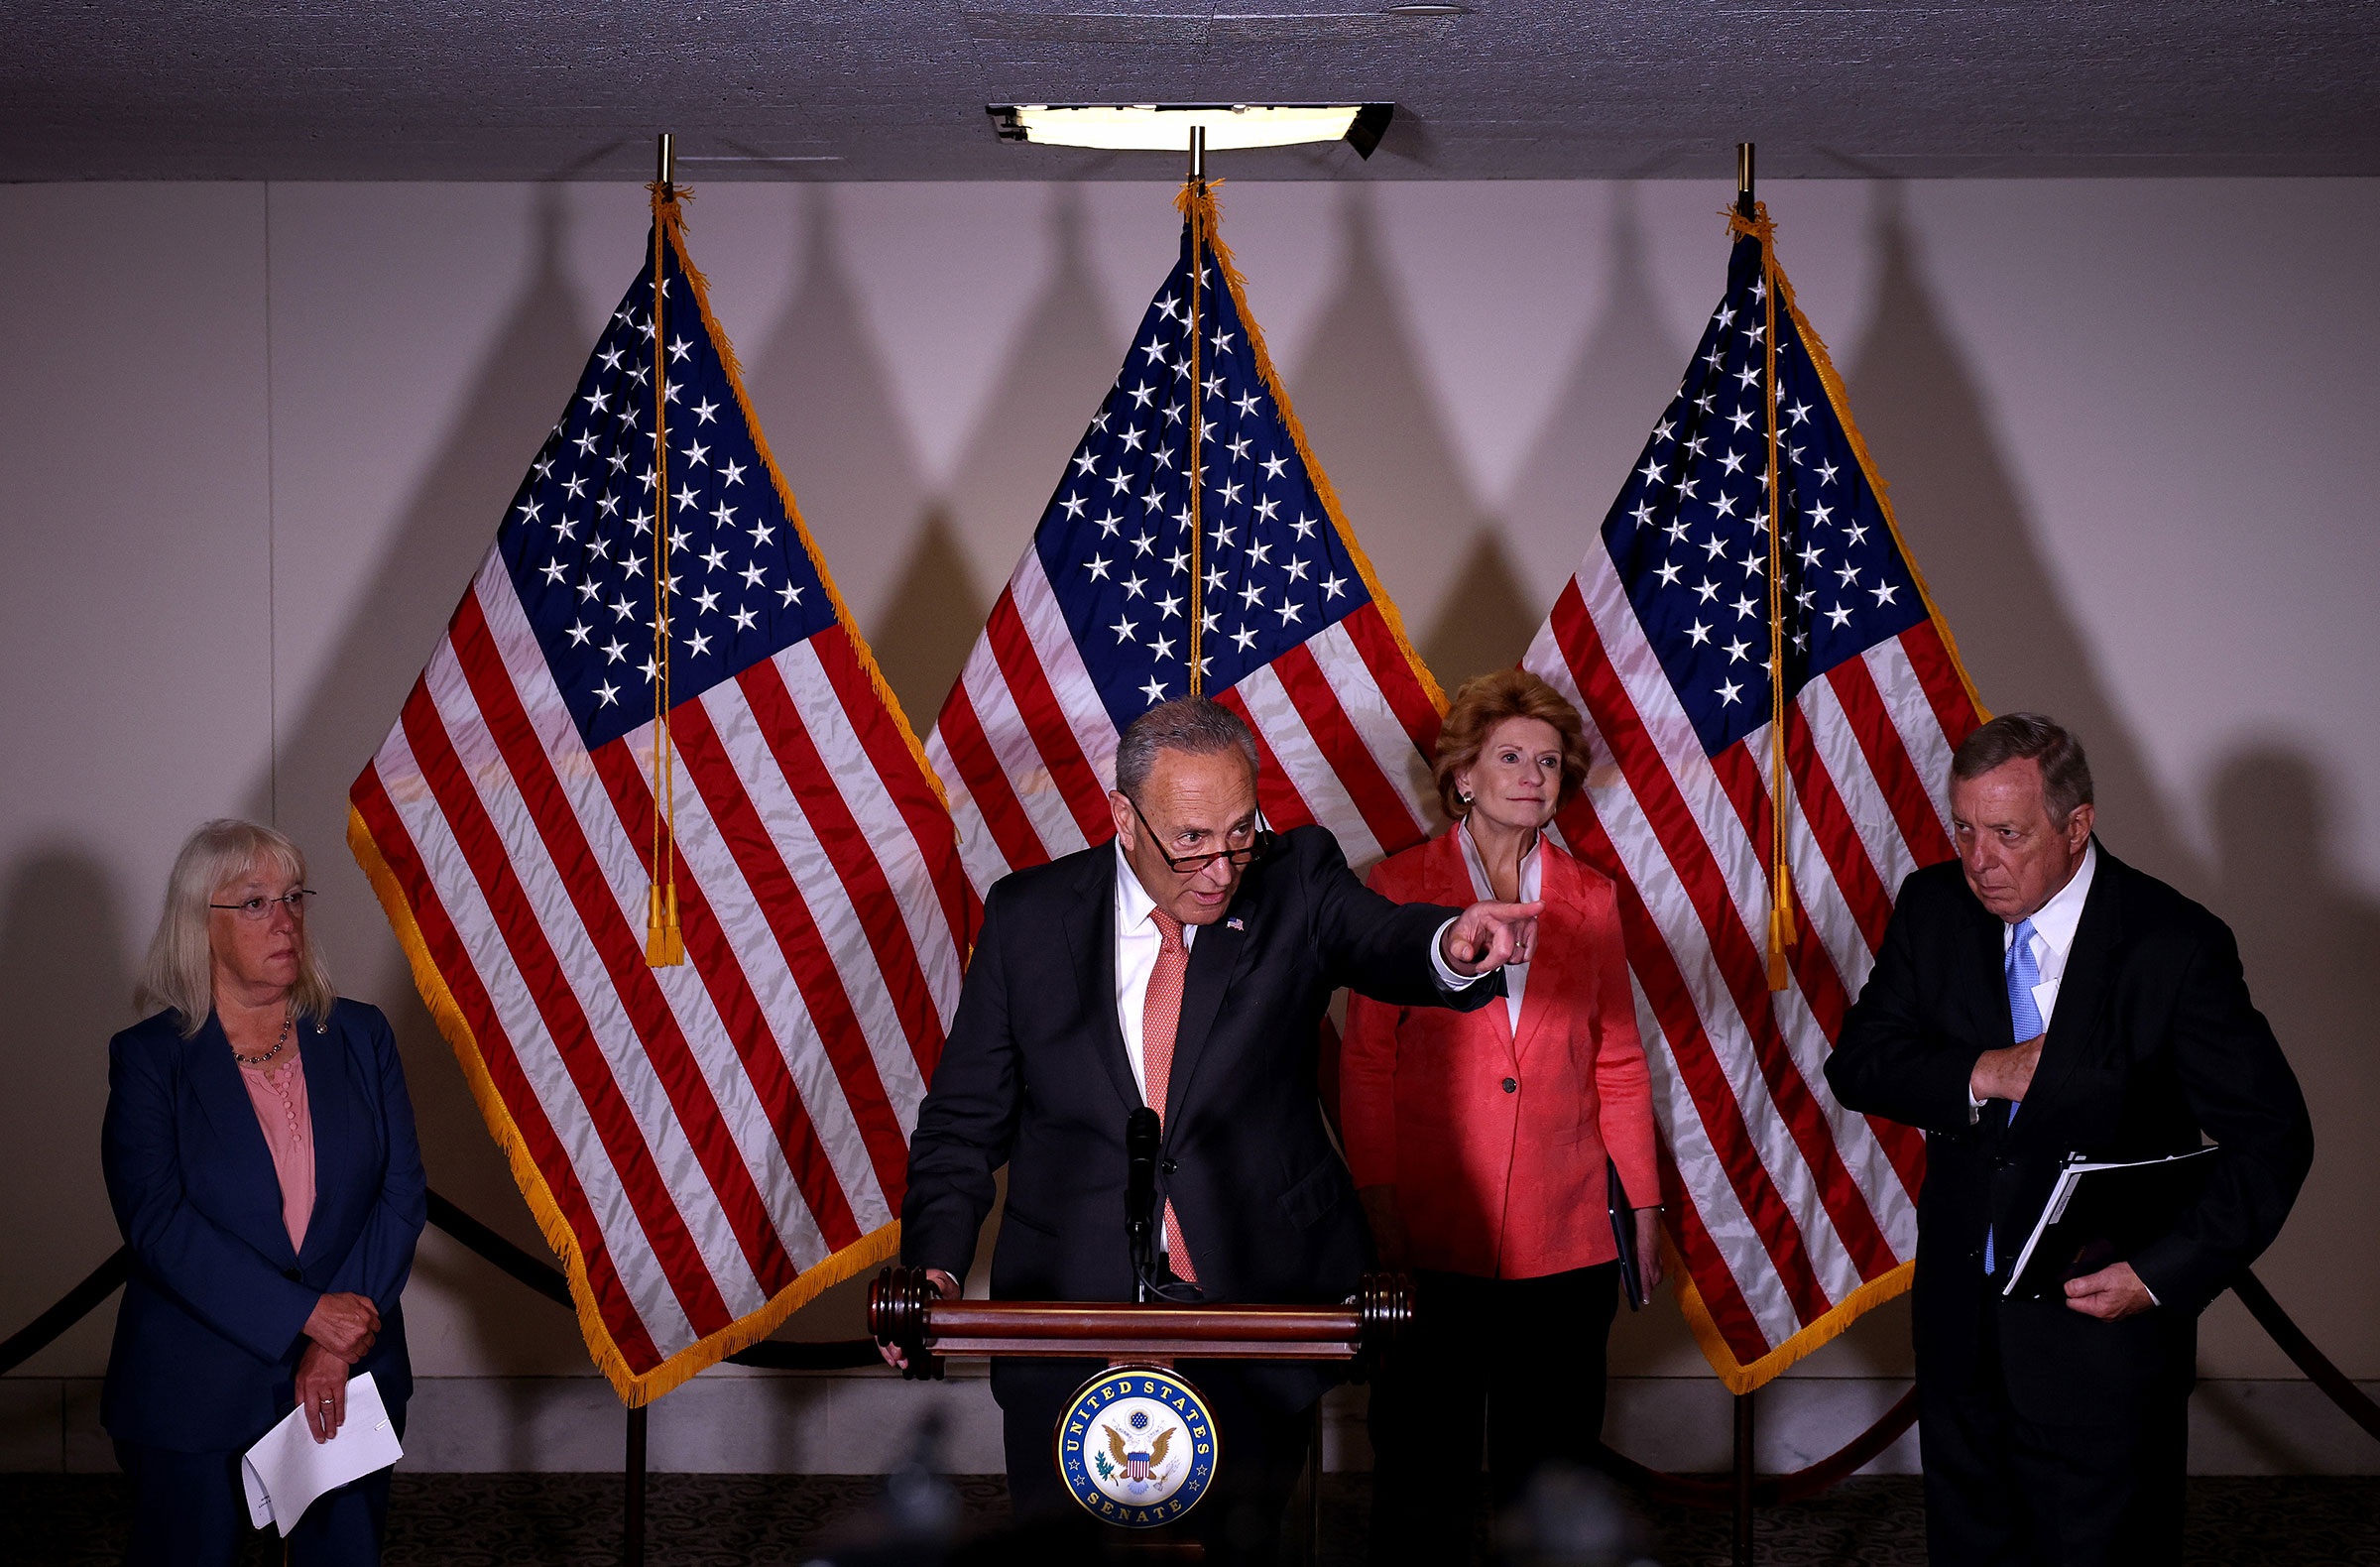 Senate Majority Leader Chuck Schumer speaks alongside Sen. Patty Murray, Sen. Debbie Stabenow, and Sen. Richard Durbin at a press conference following a Senate Democratic luncheon on Capitol Hill on June 08, 2021.